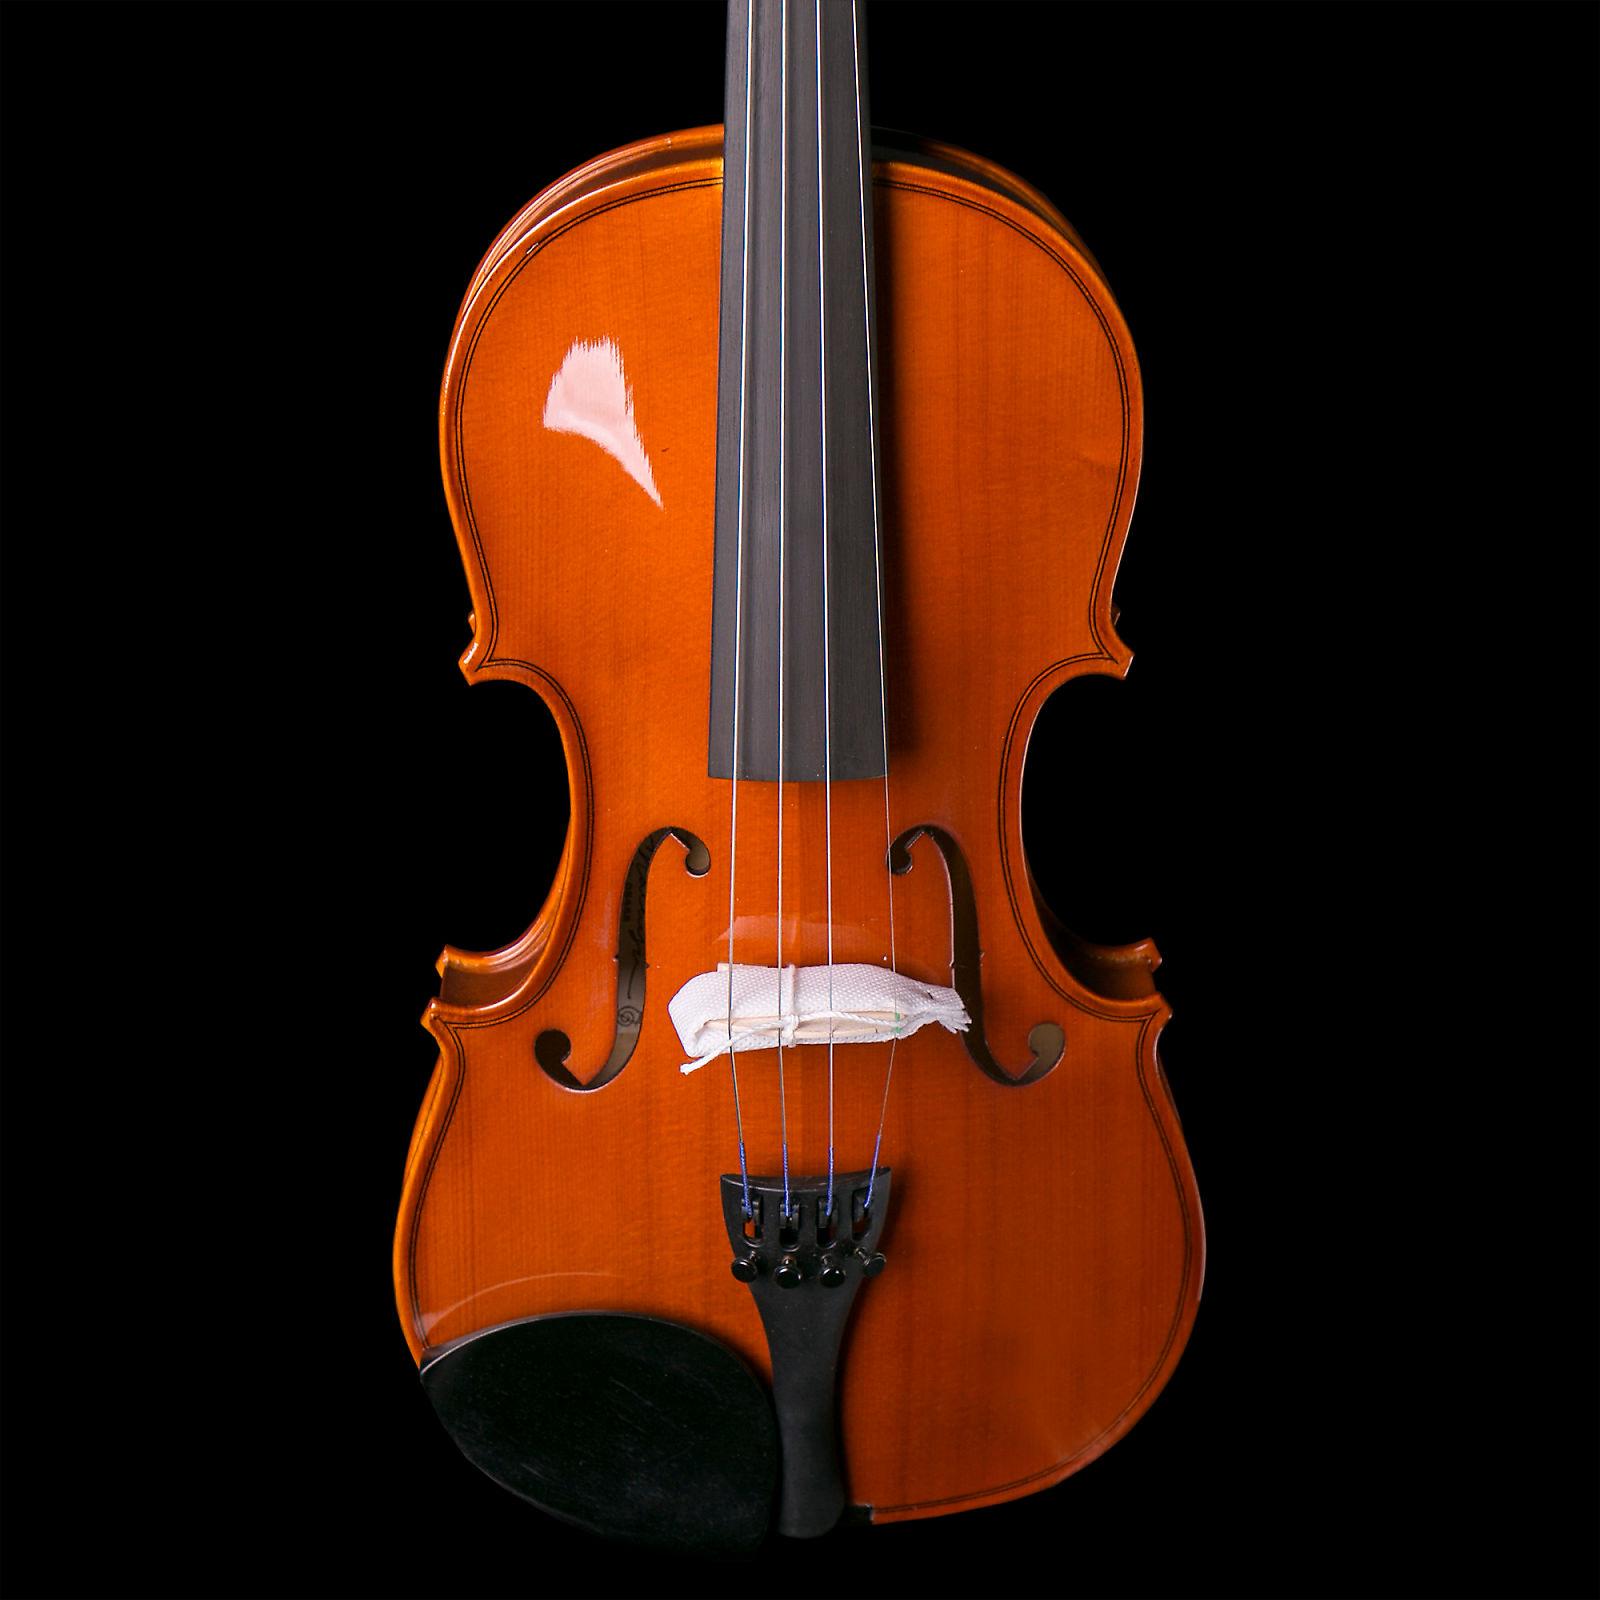 Yamaha v3ska34 3 4 size beginner acoustic violin reverb for Yamaha vc5 cello review